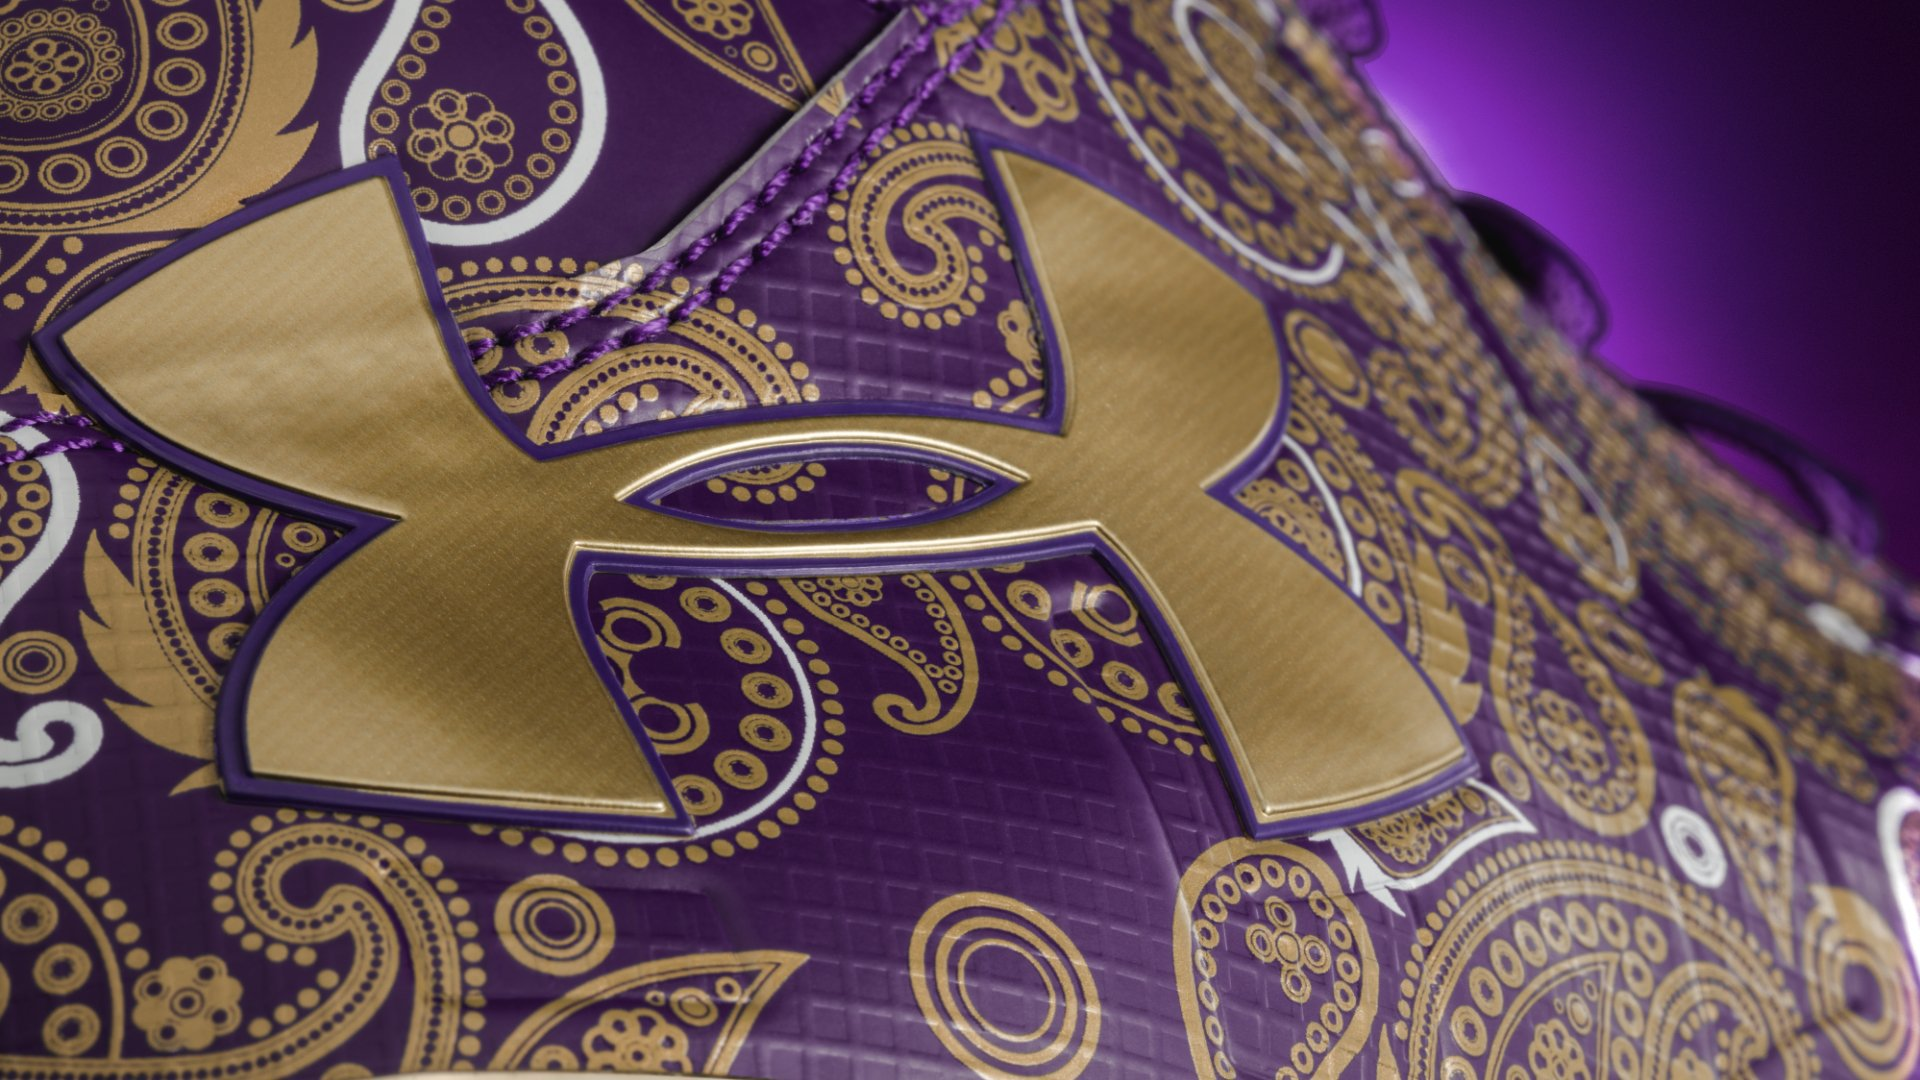 Cam Newton Prince Cleats Logo